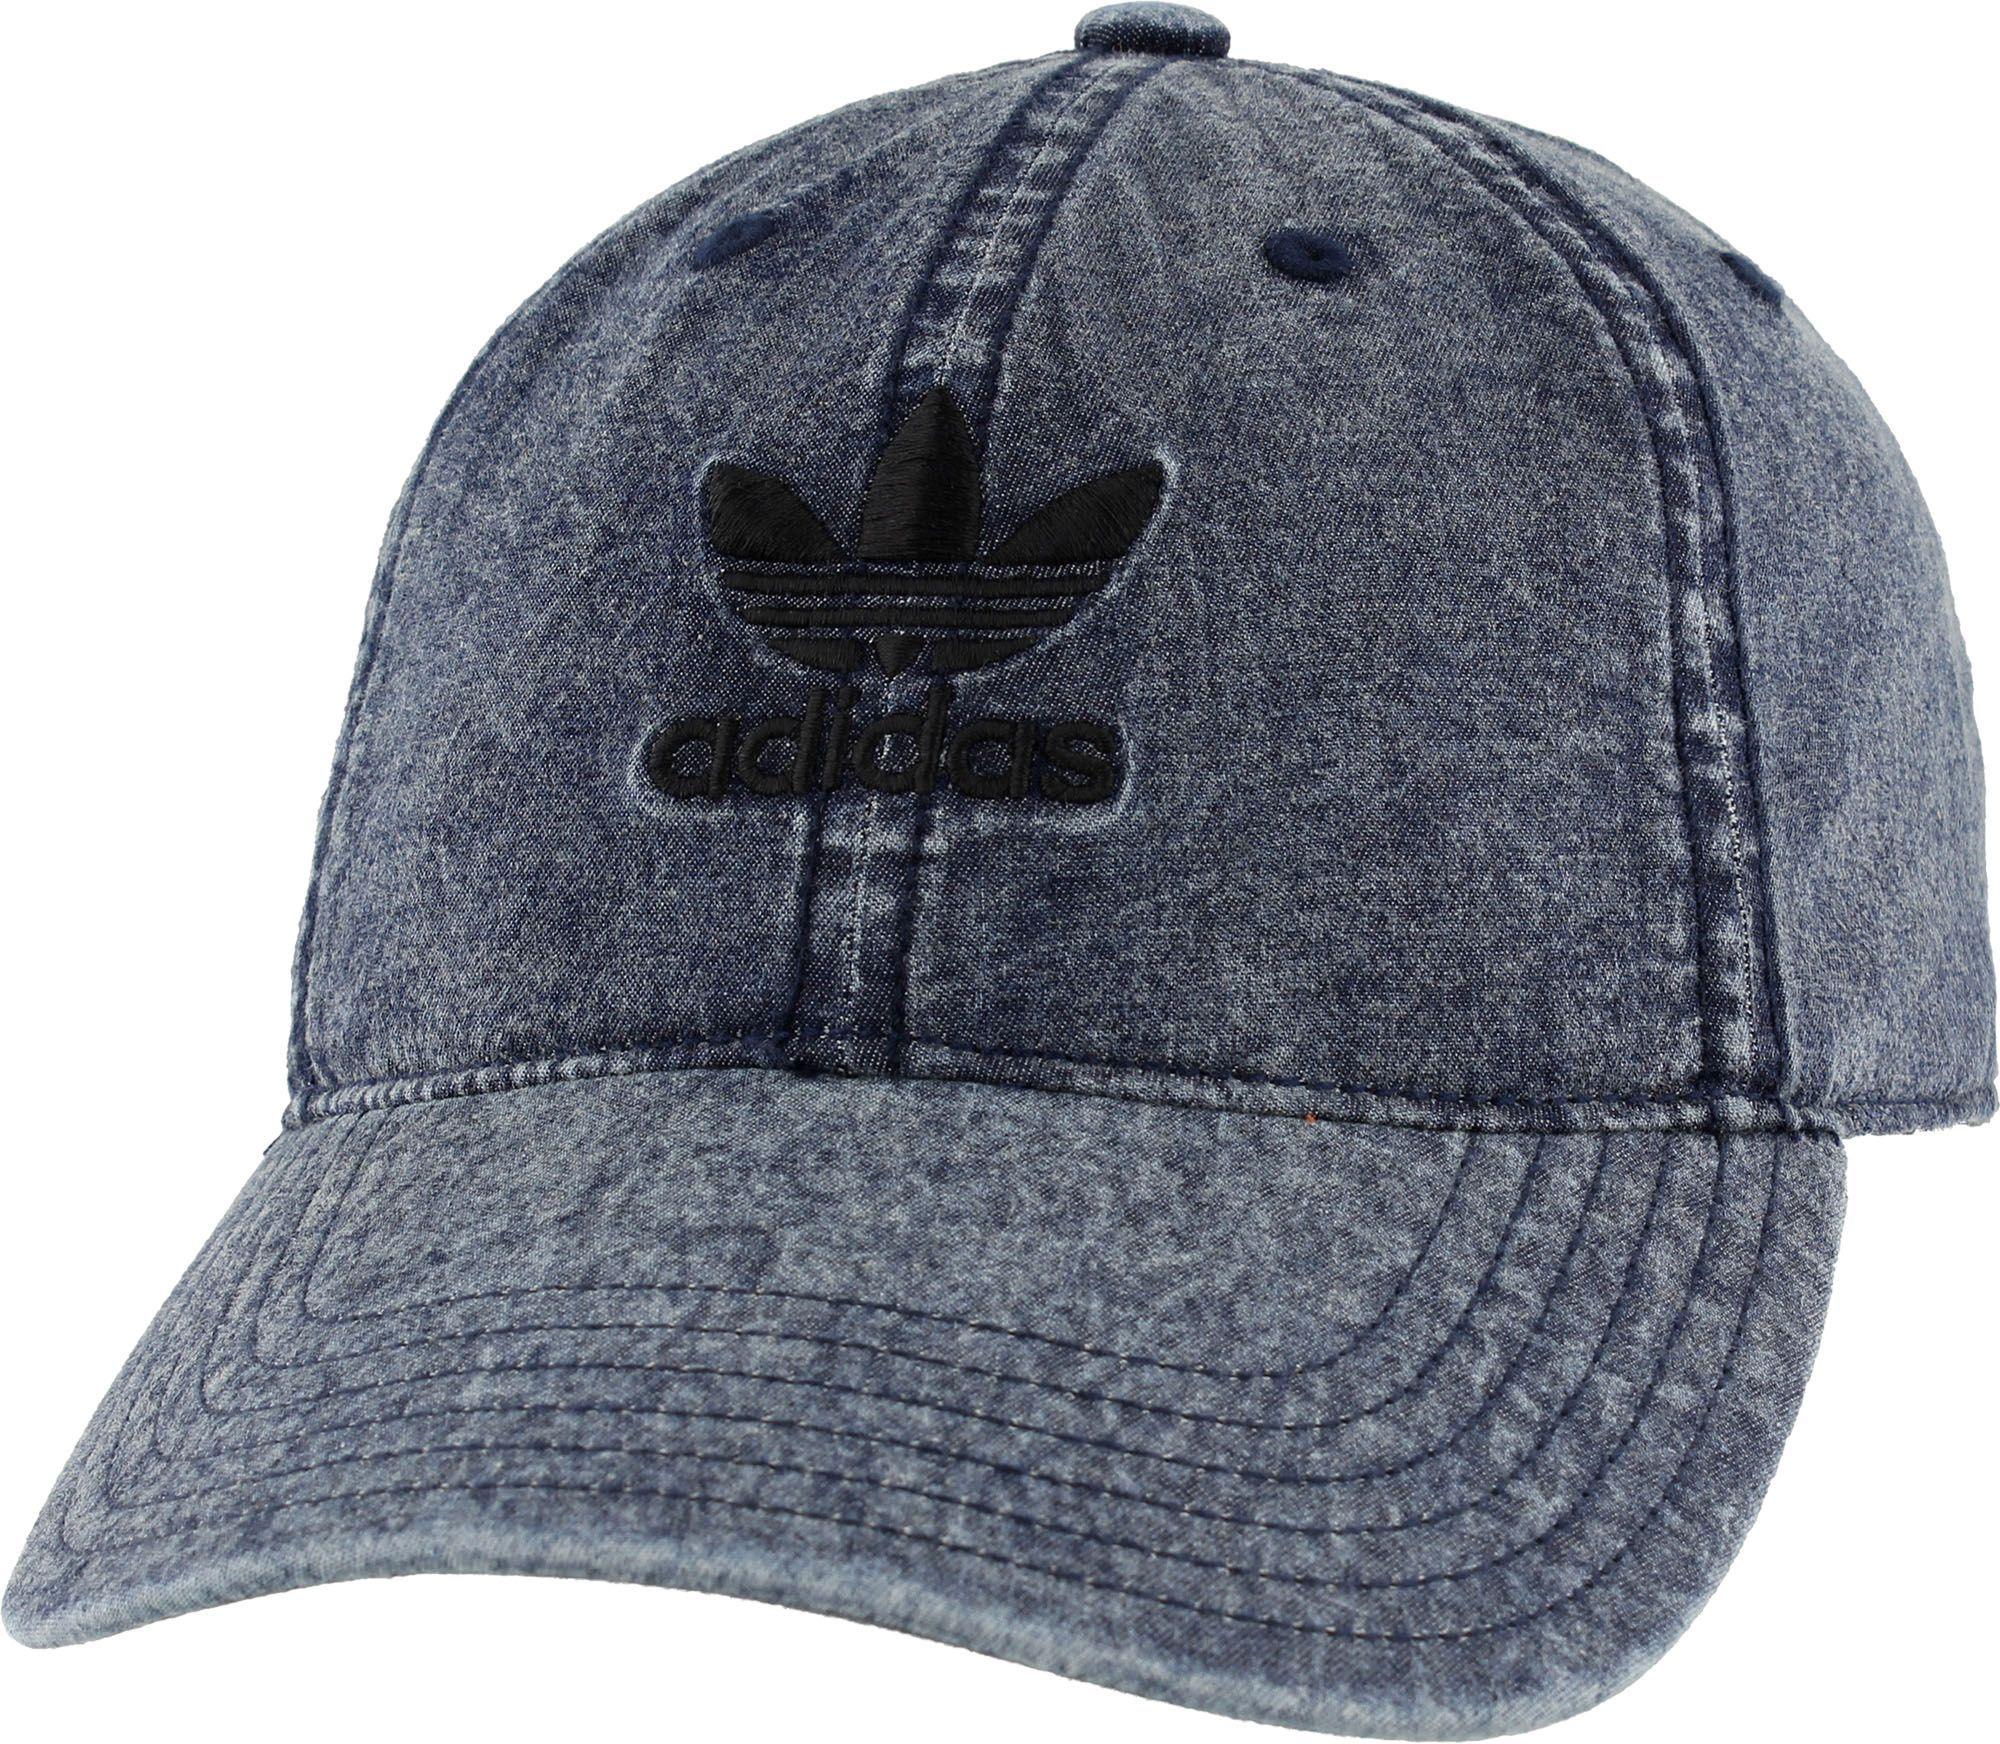 607dddc0ac adidas Men's Originals Relaxed Hat | Products | Adidas men, Adidas ...